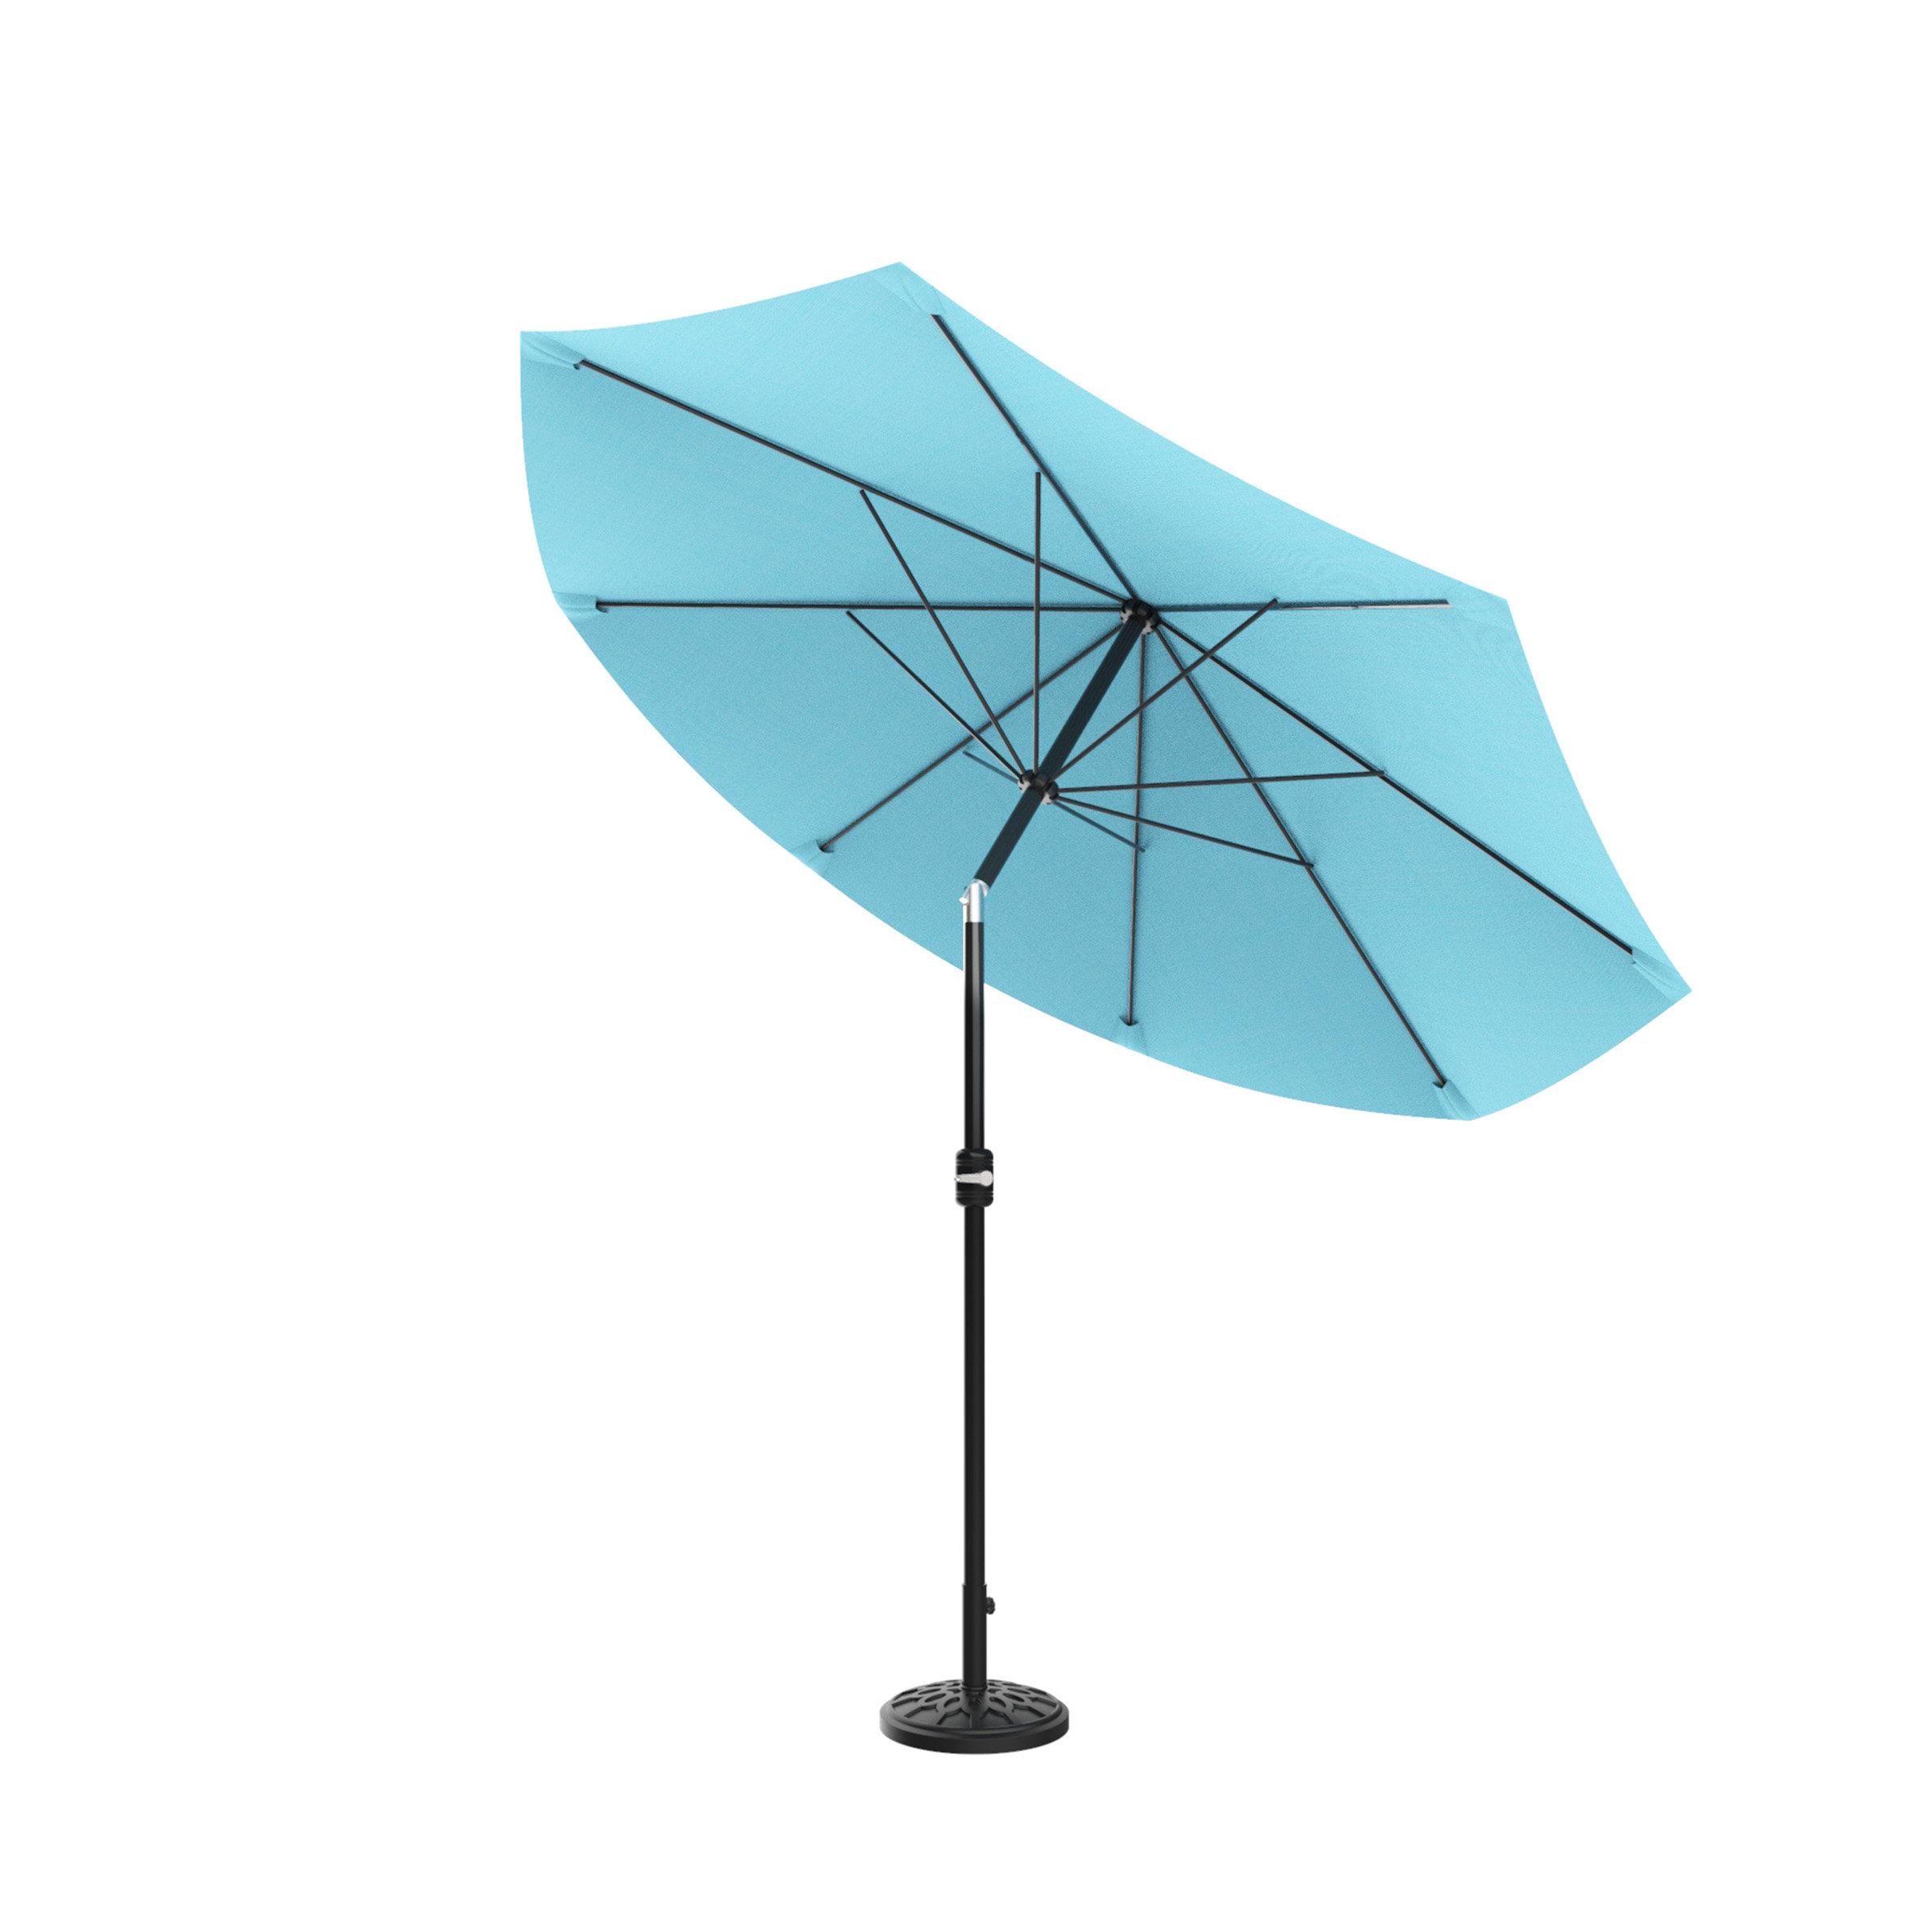 Fashionable Crowborough Square Market Umbrellas In Beachcrest Home Kelton 10' Market Umbrella (View 11 of 20)